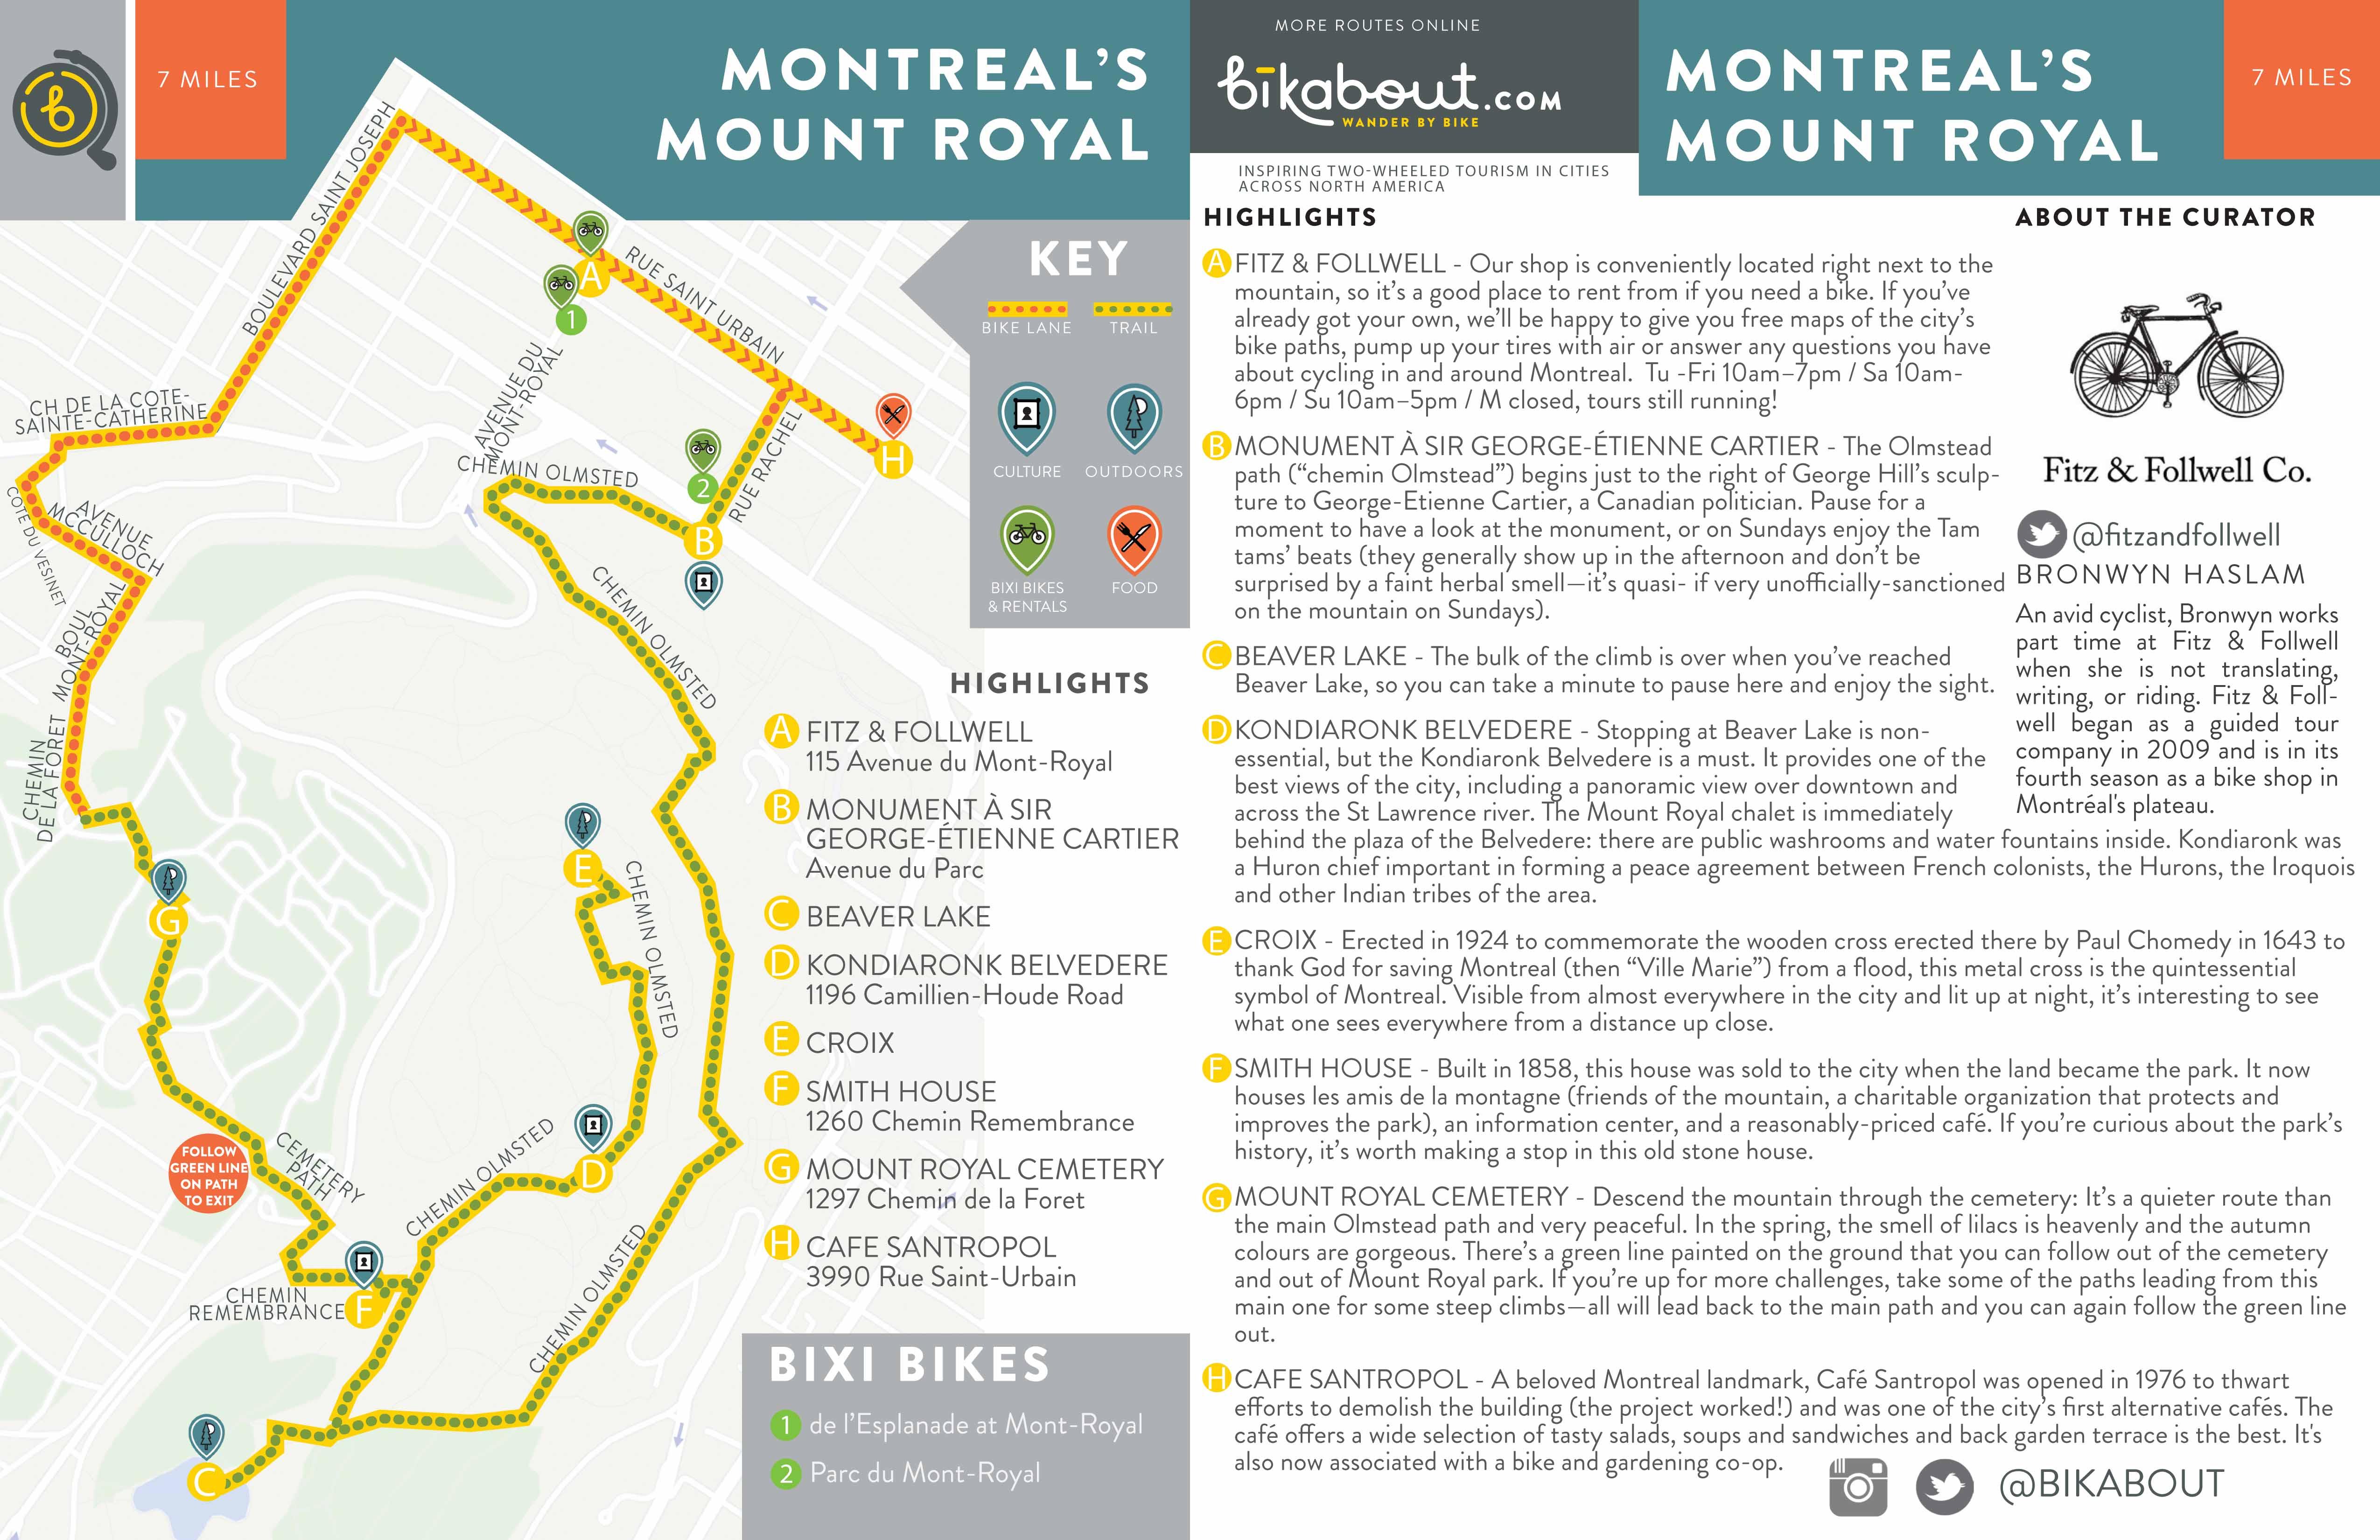 Mount Royal Map Montreal's Mount Royal — bikabout Mount Royal Map